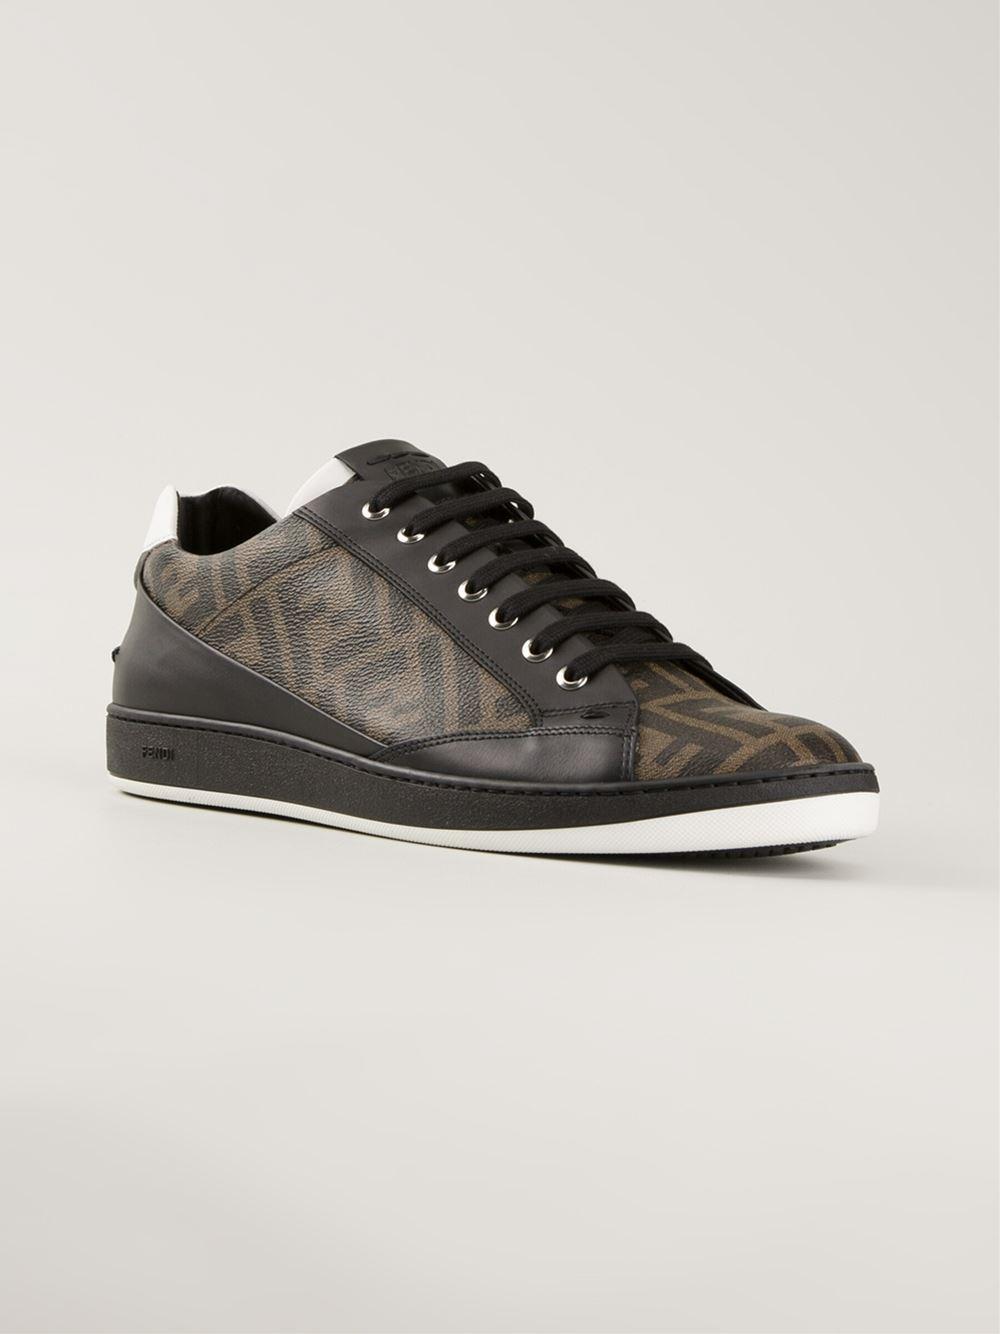 Fendi Shoes Brown